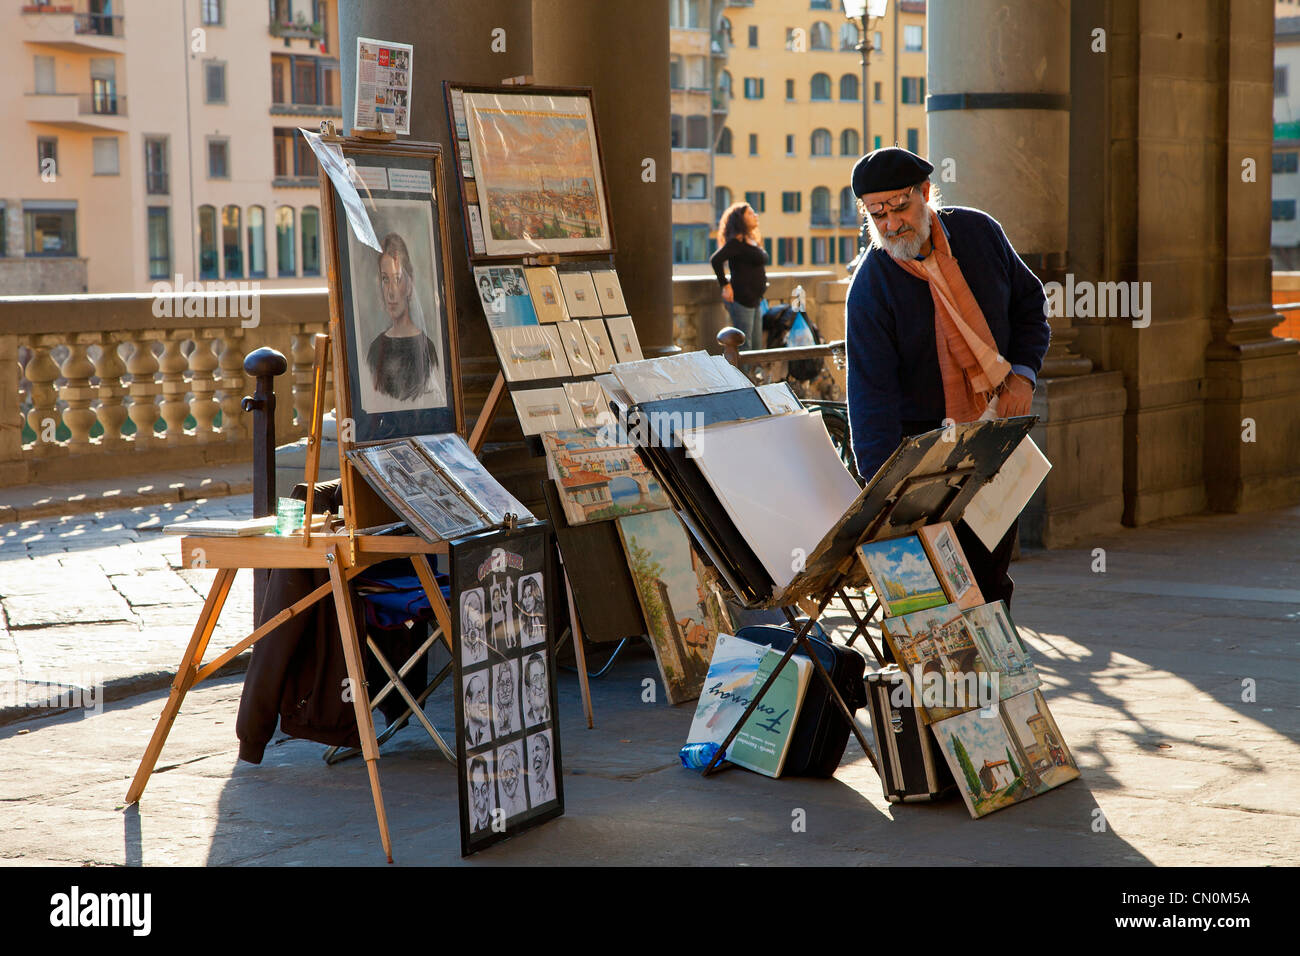 Europe, Italy, Florence, Street artist Painter at Uffizi Piazzale - Stock Image